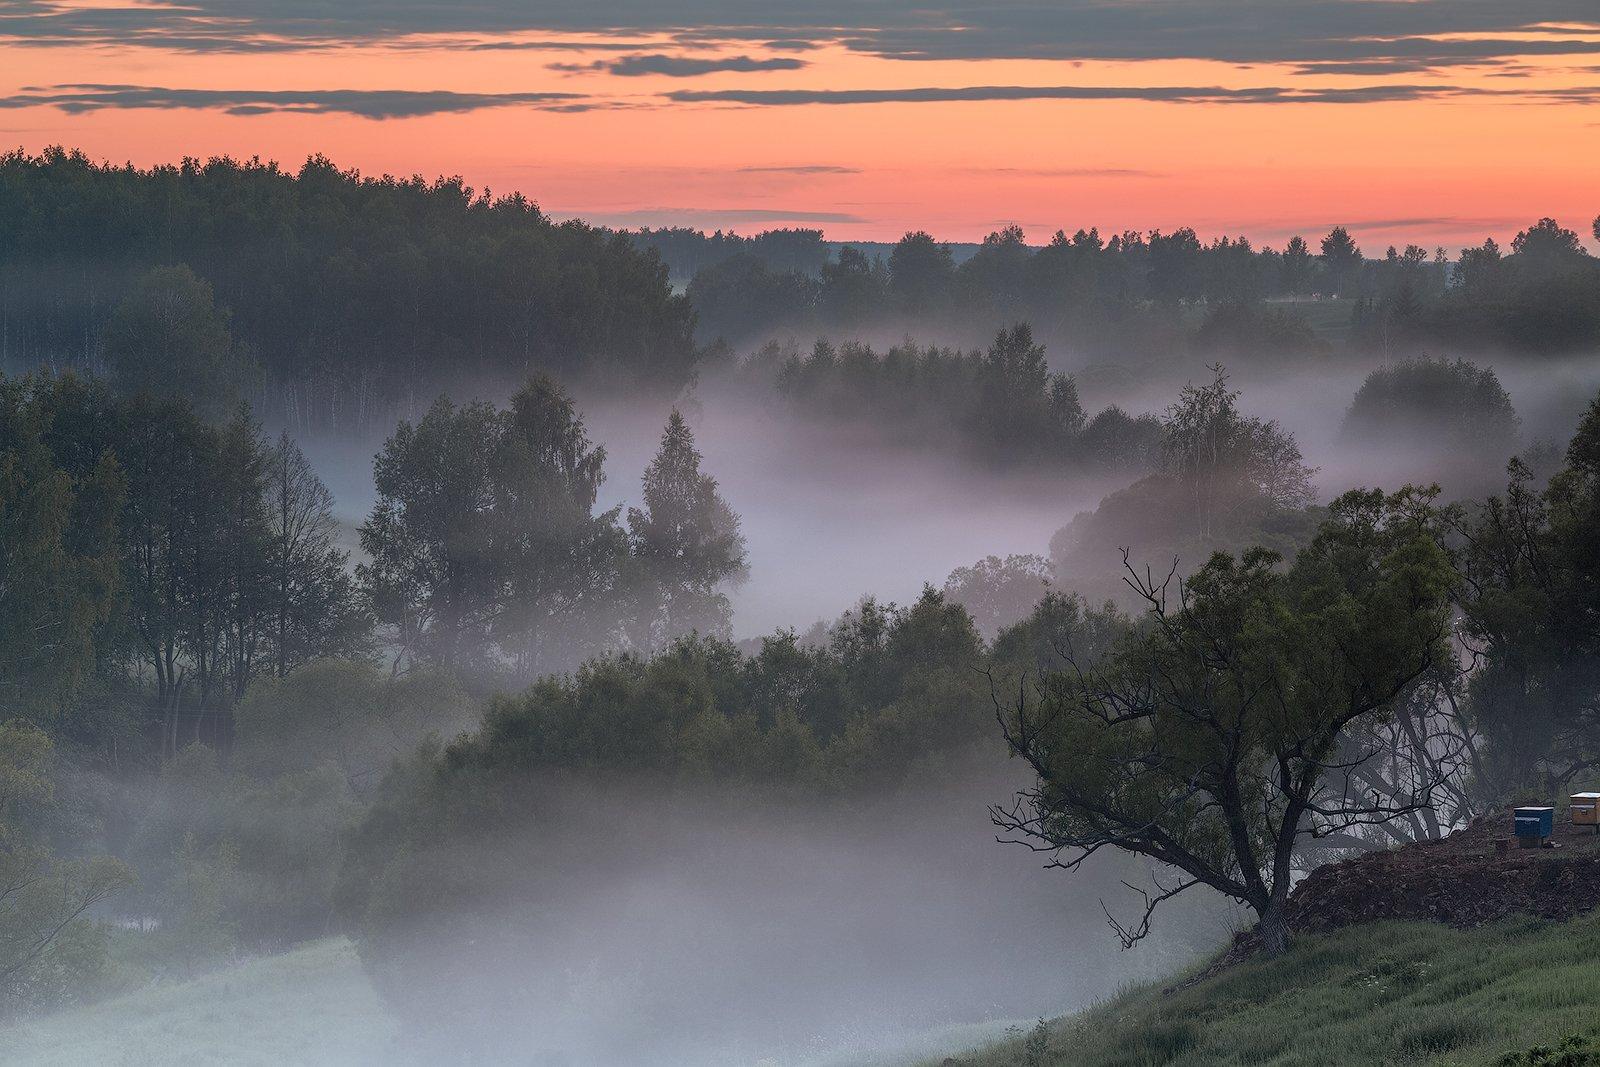 landscape, пейзаж, sunset, туман,, Алексей Самойленко